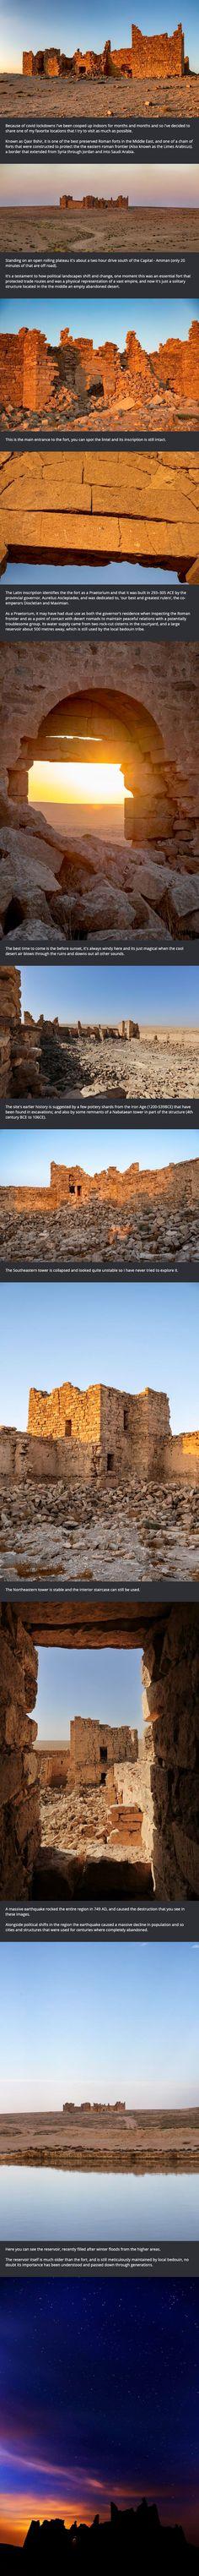 Untouched Roman Fort in the Jordanian Desert ...